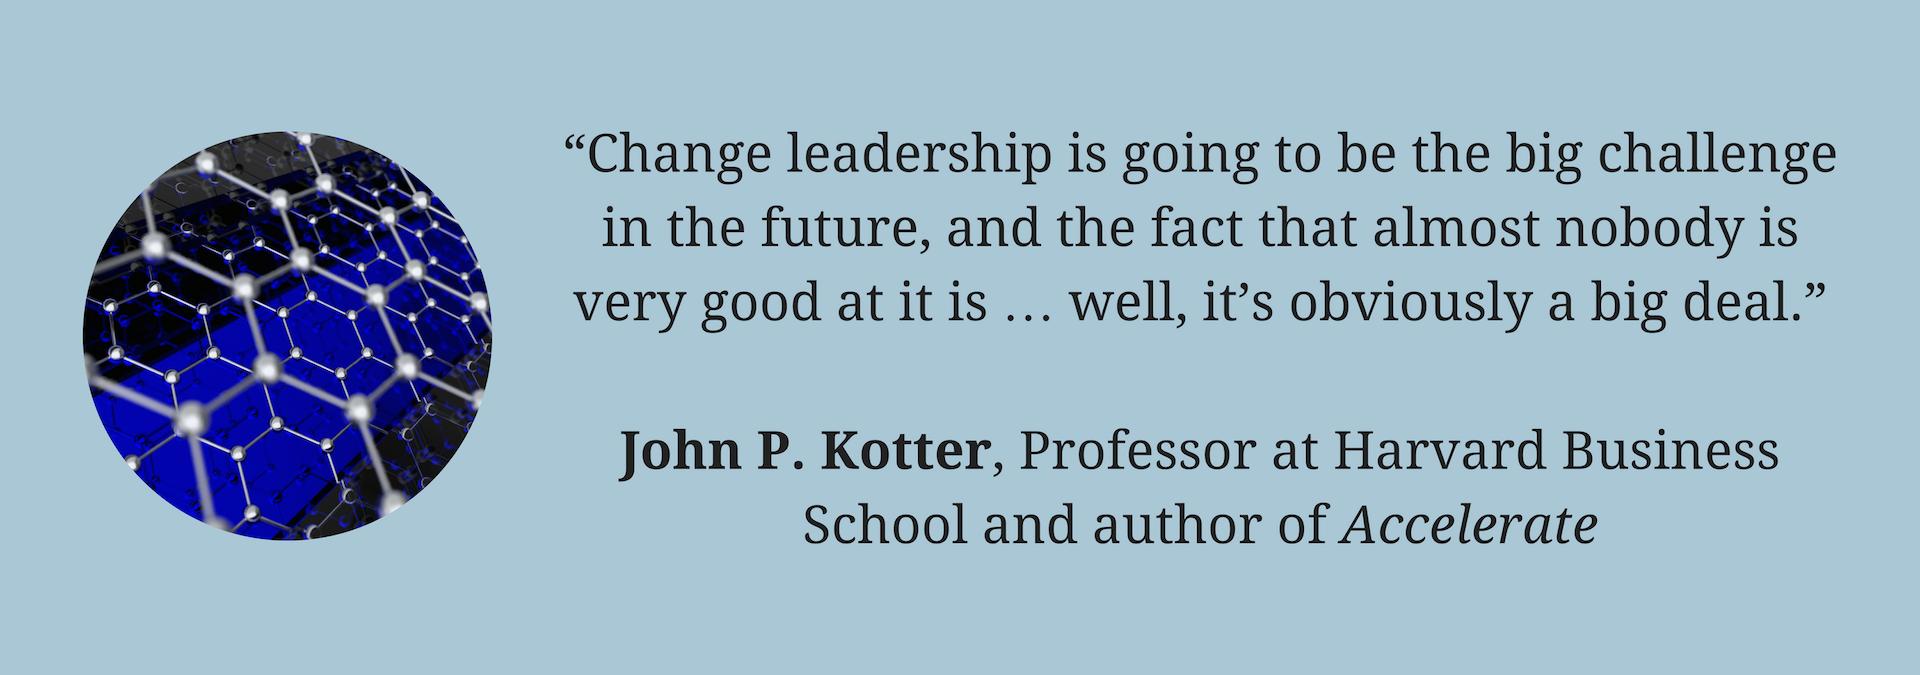 John Kotter.png